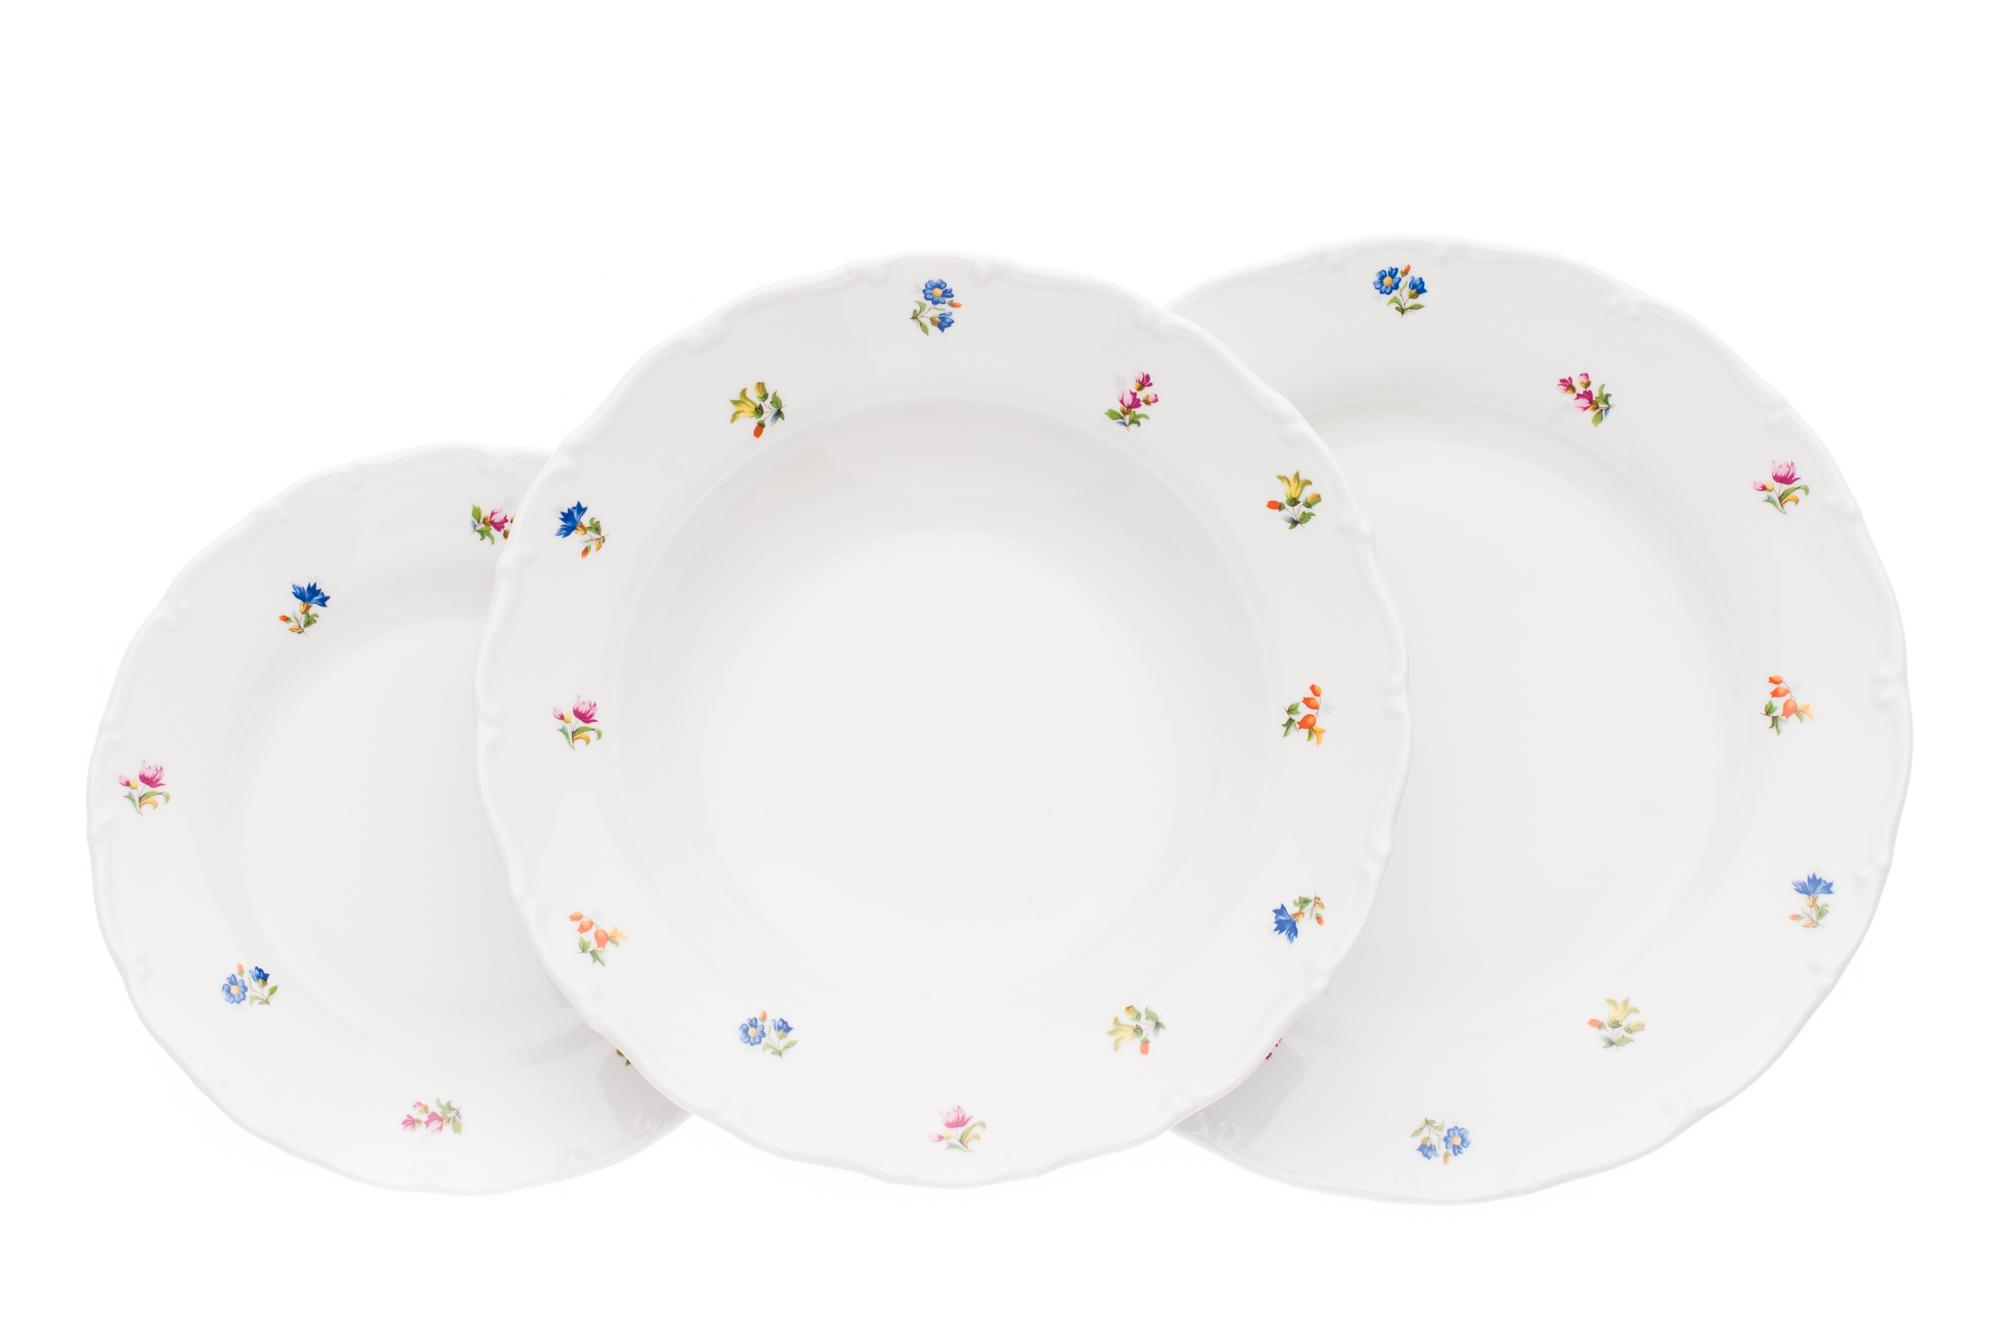 Sada talířů, karlovarský porcelán, Stará Role, Ofélie, házenka, 18 dílná